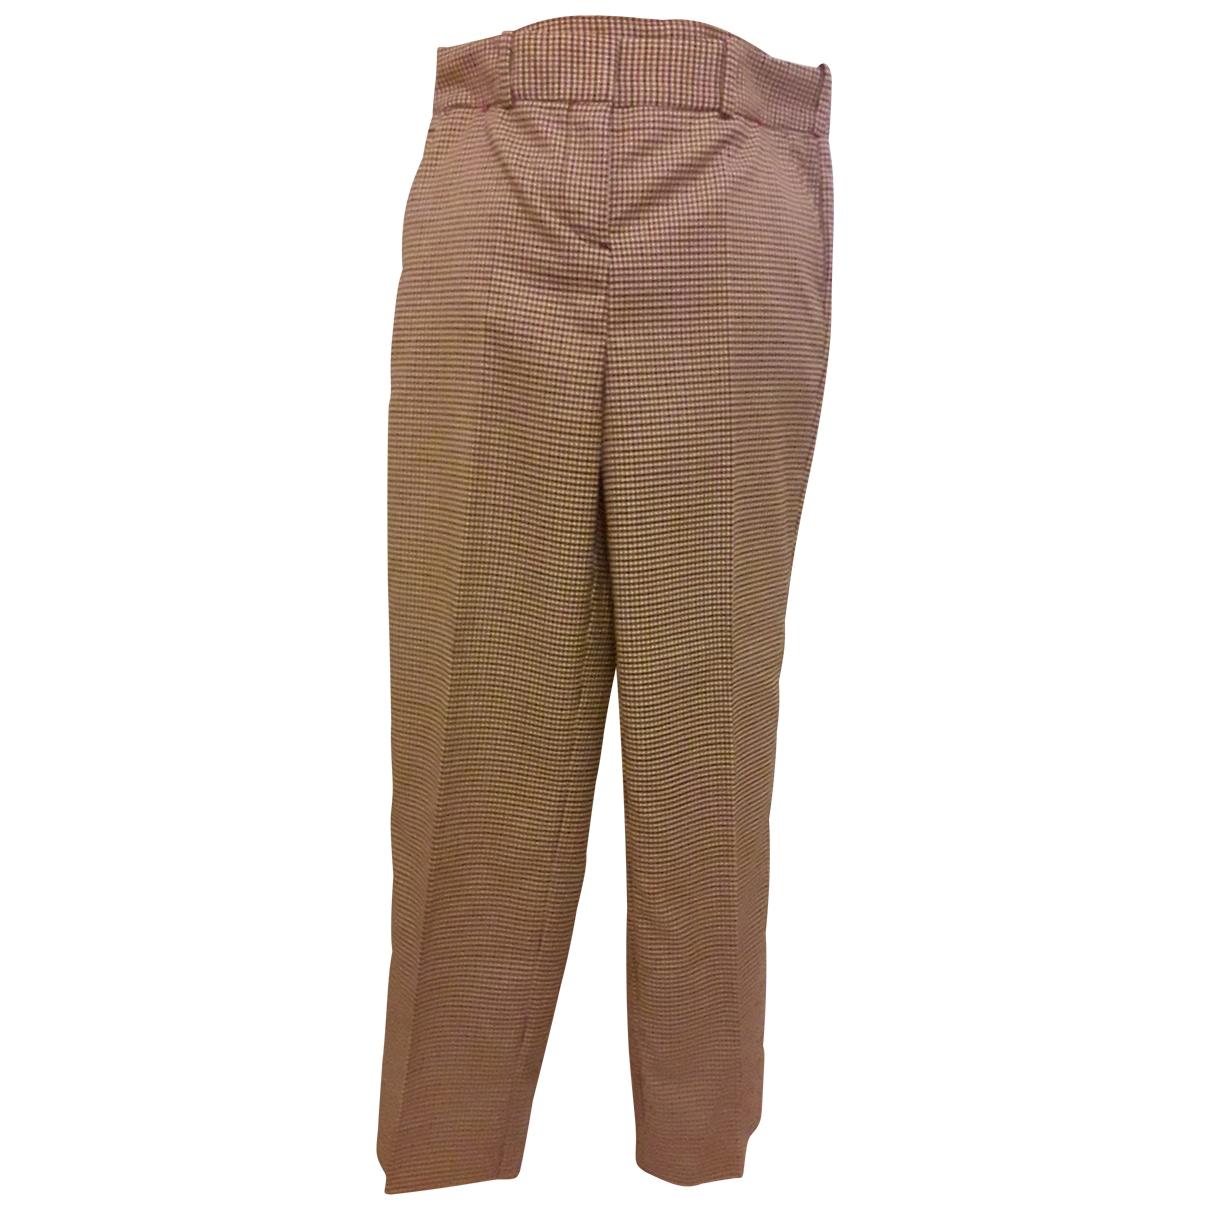 Maje Fall Winter 2019 Ecru Trousers for Women 36 FR